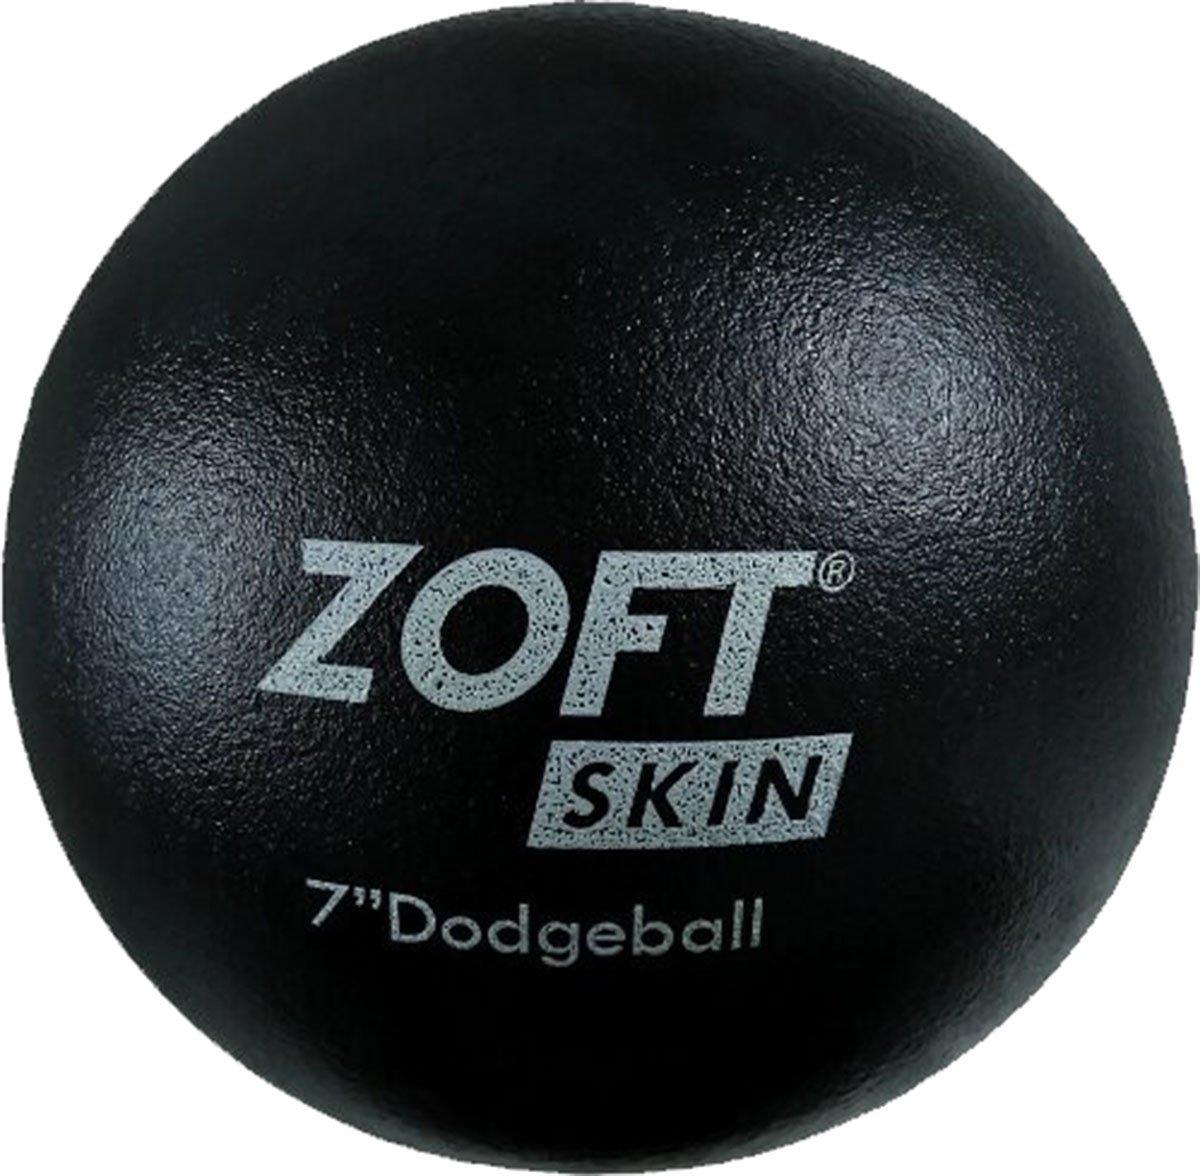 Zoftskin Dodgeball 178mm (7'')